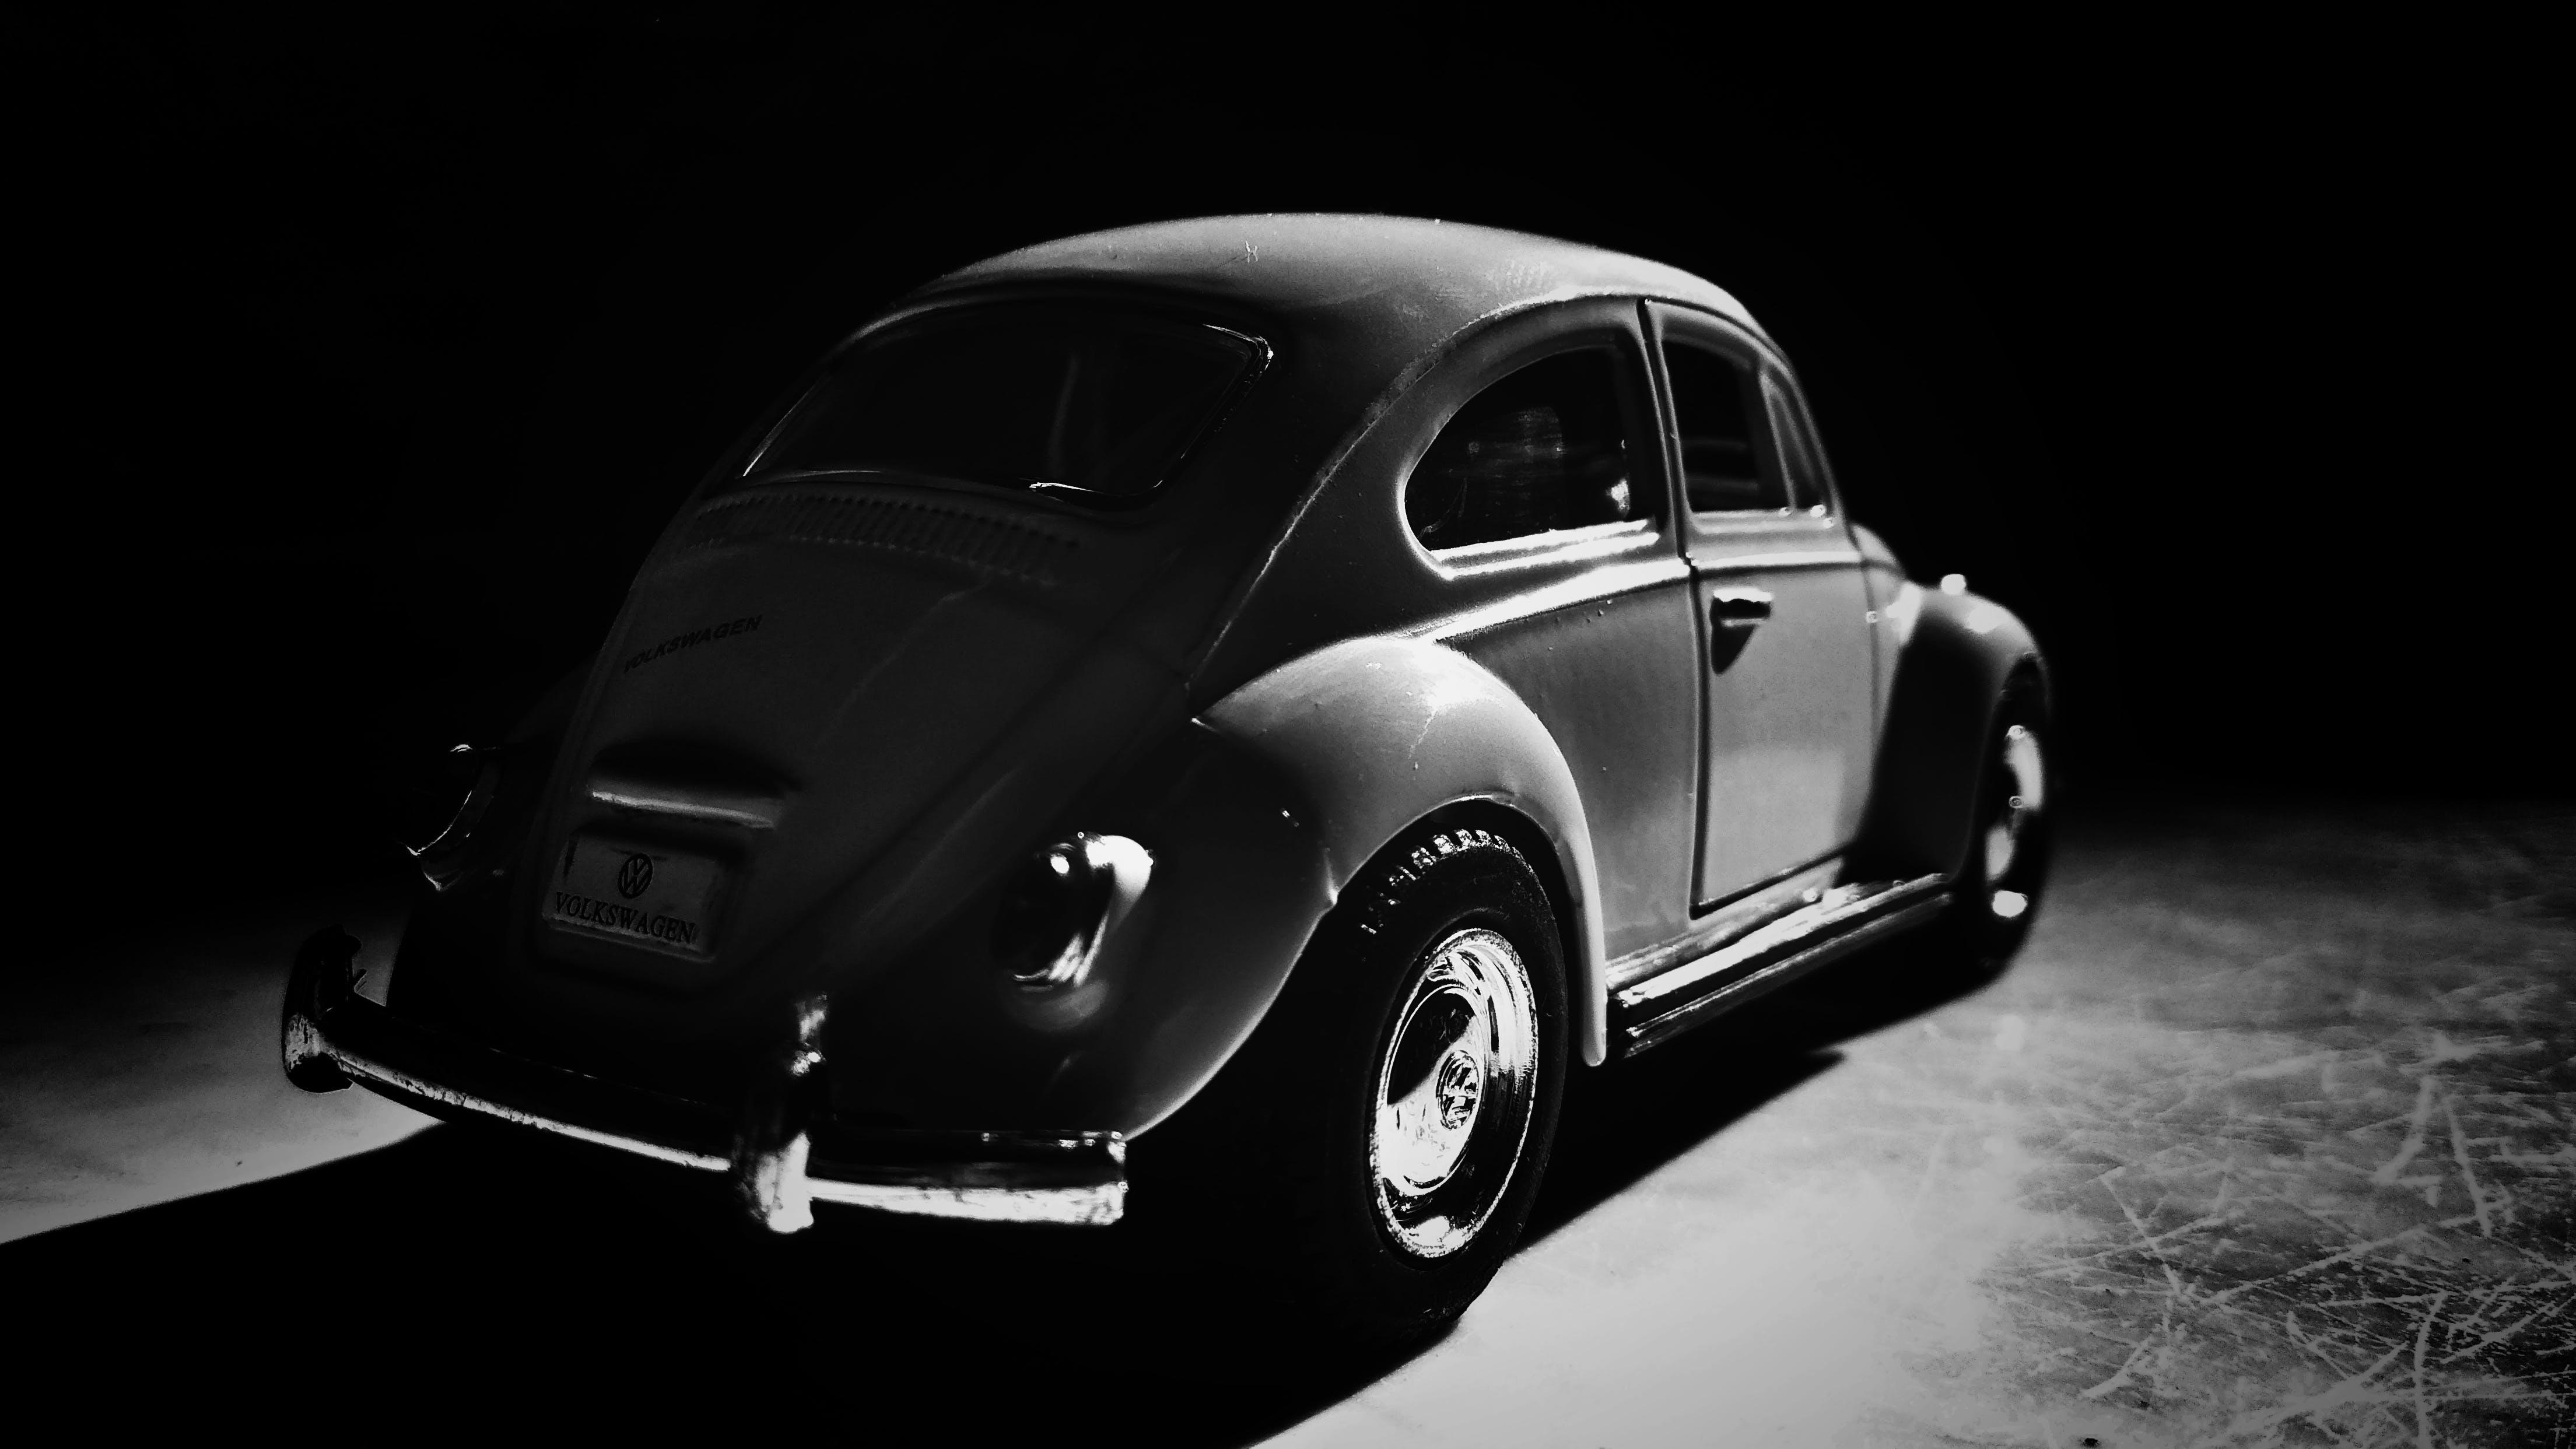 Free stock photo of automobile, automobiles, automotive, car